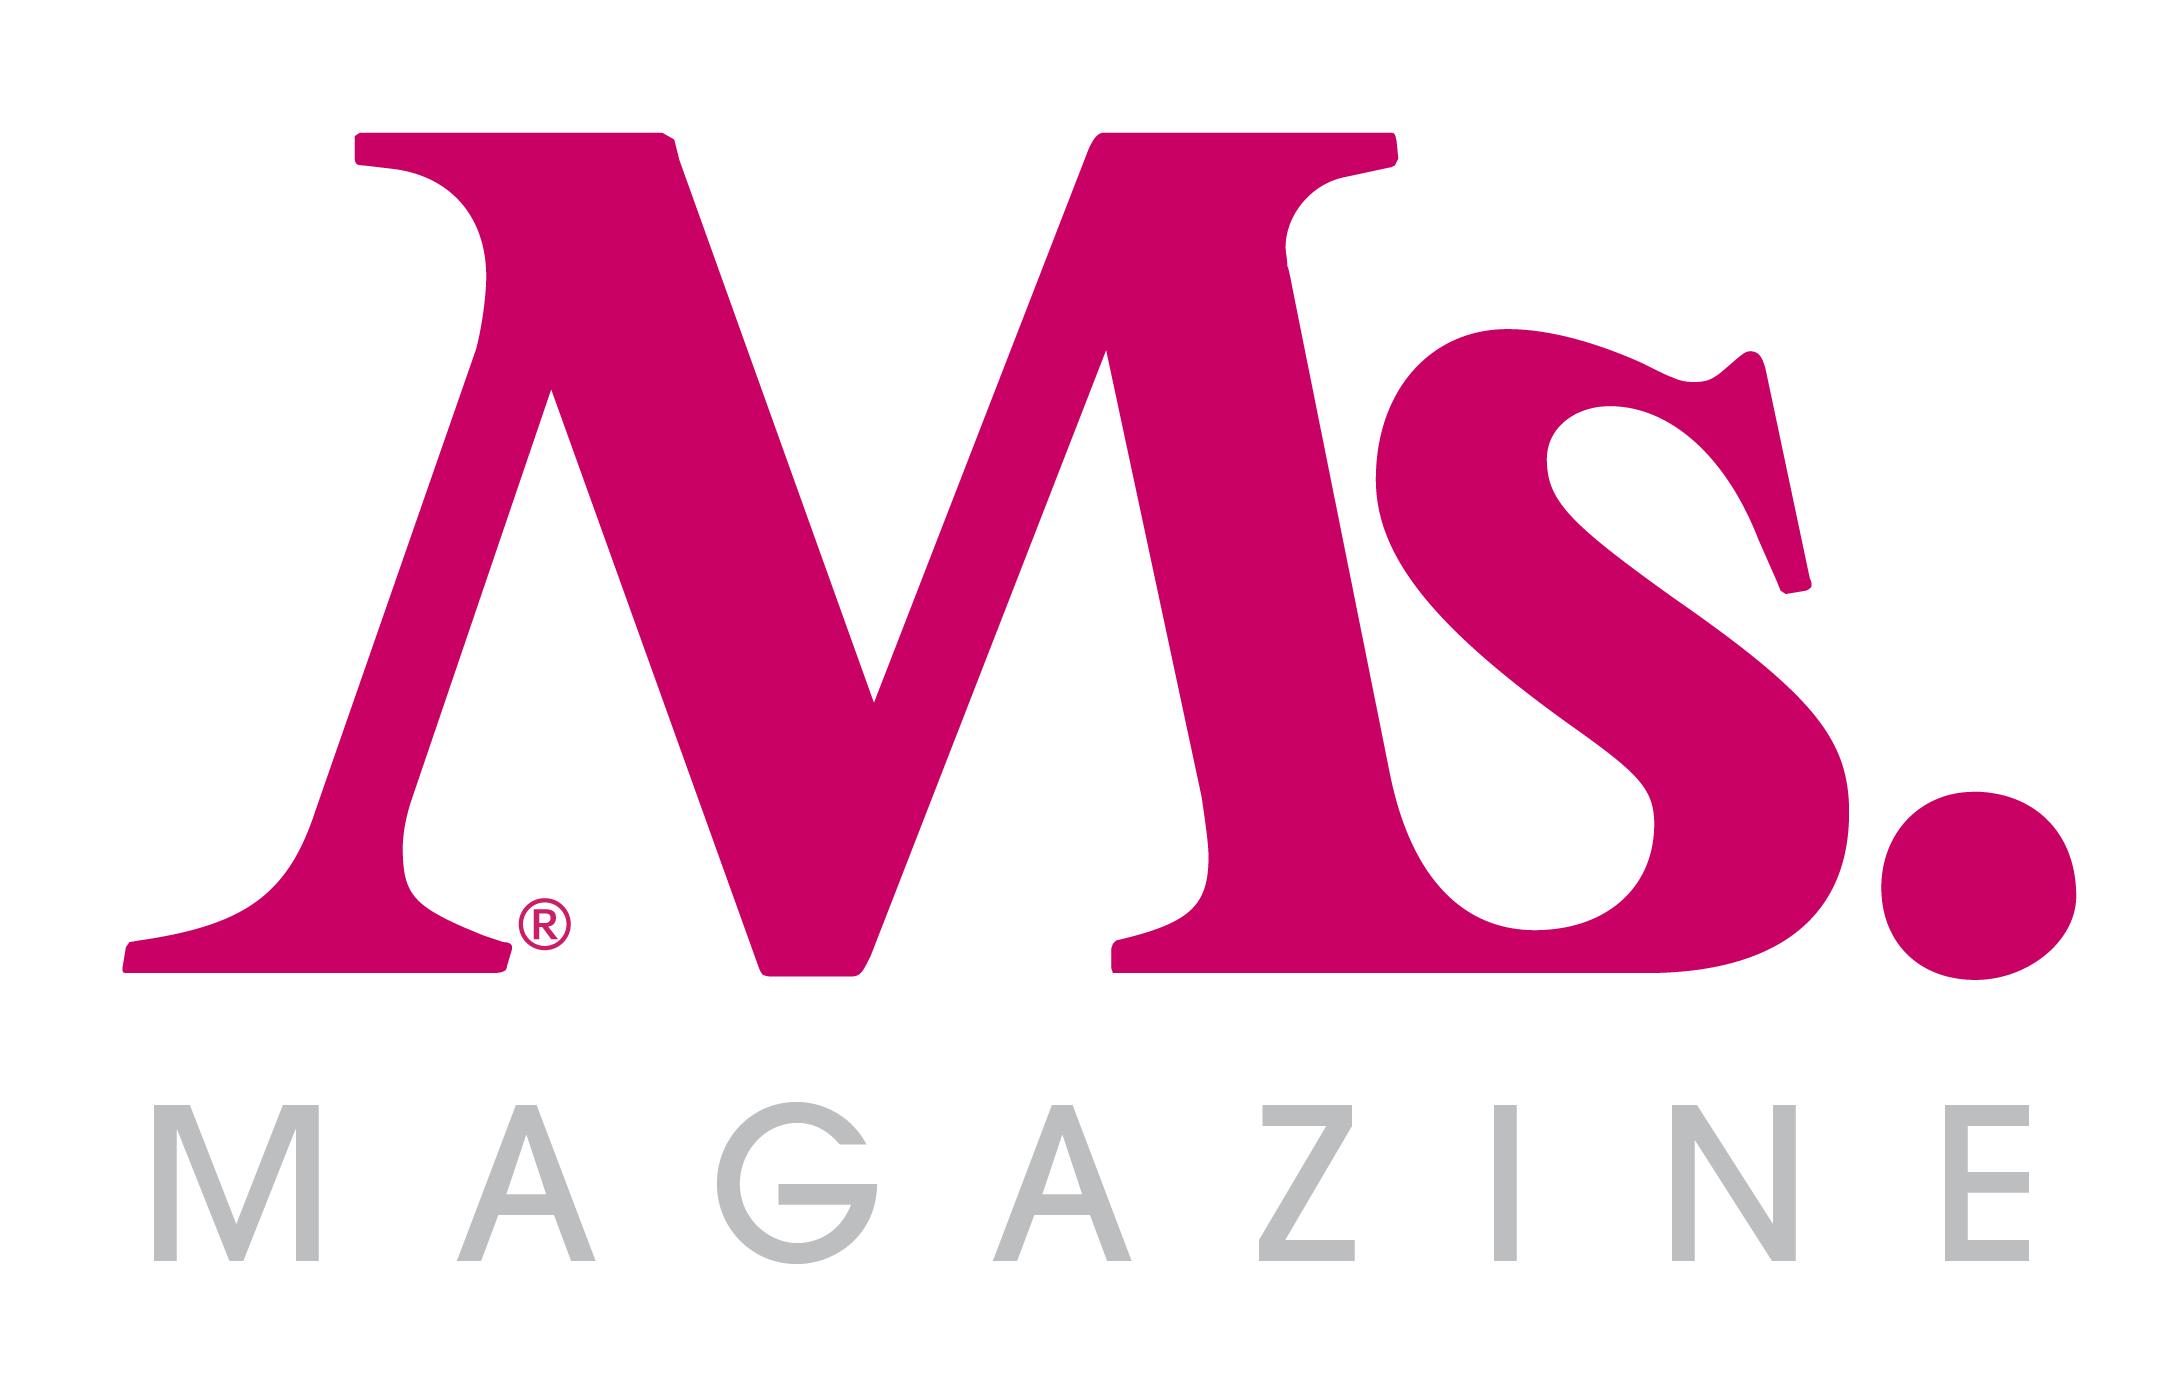 Ms. Magazine Logo.png